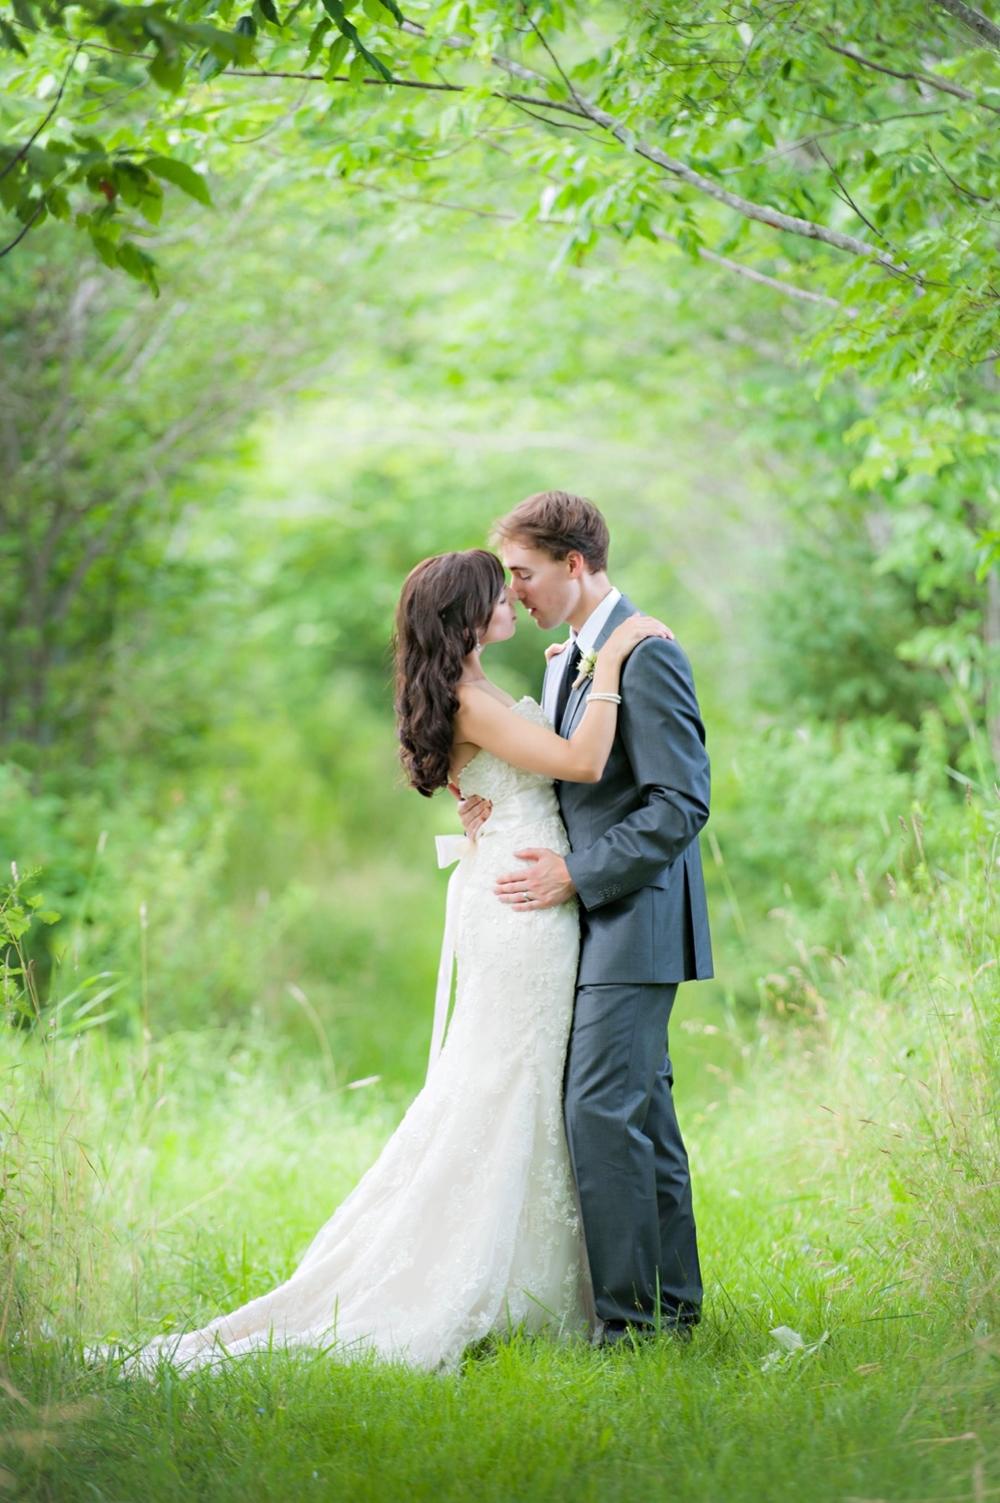 Halifax-Wedding-Photography011.jpg